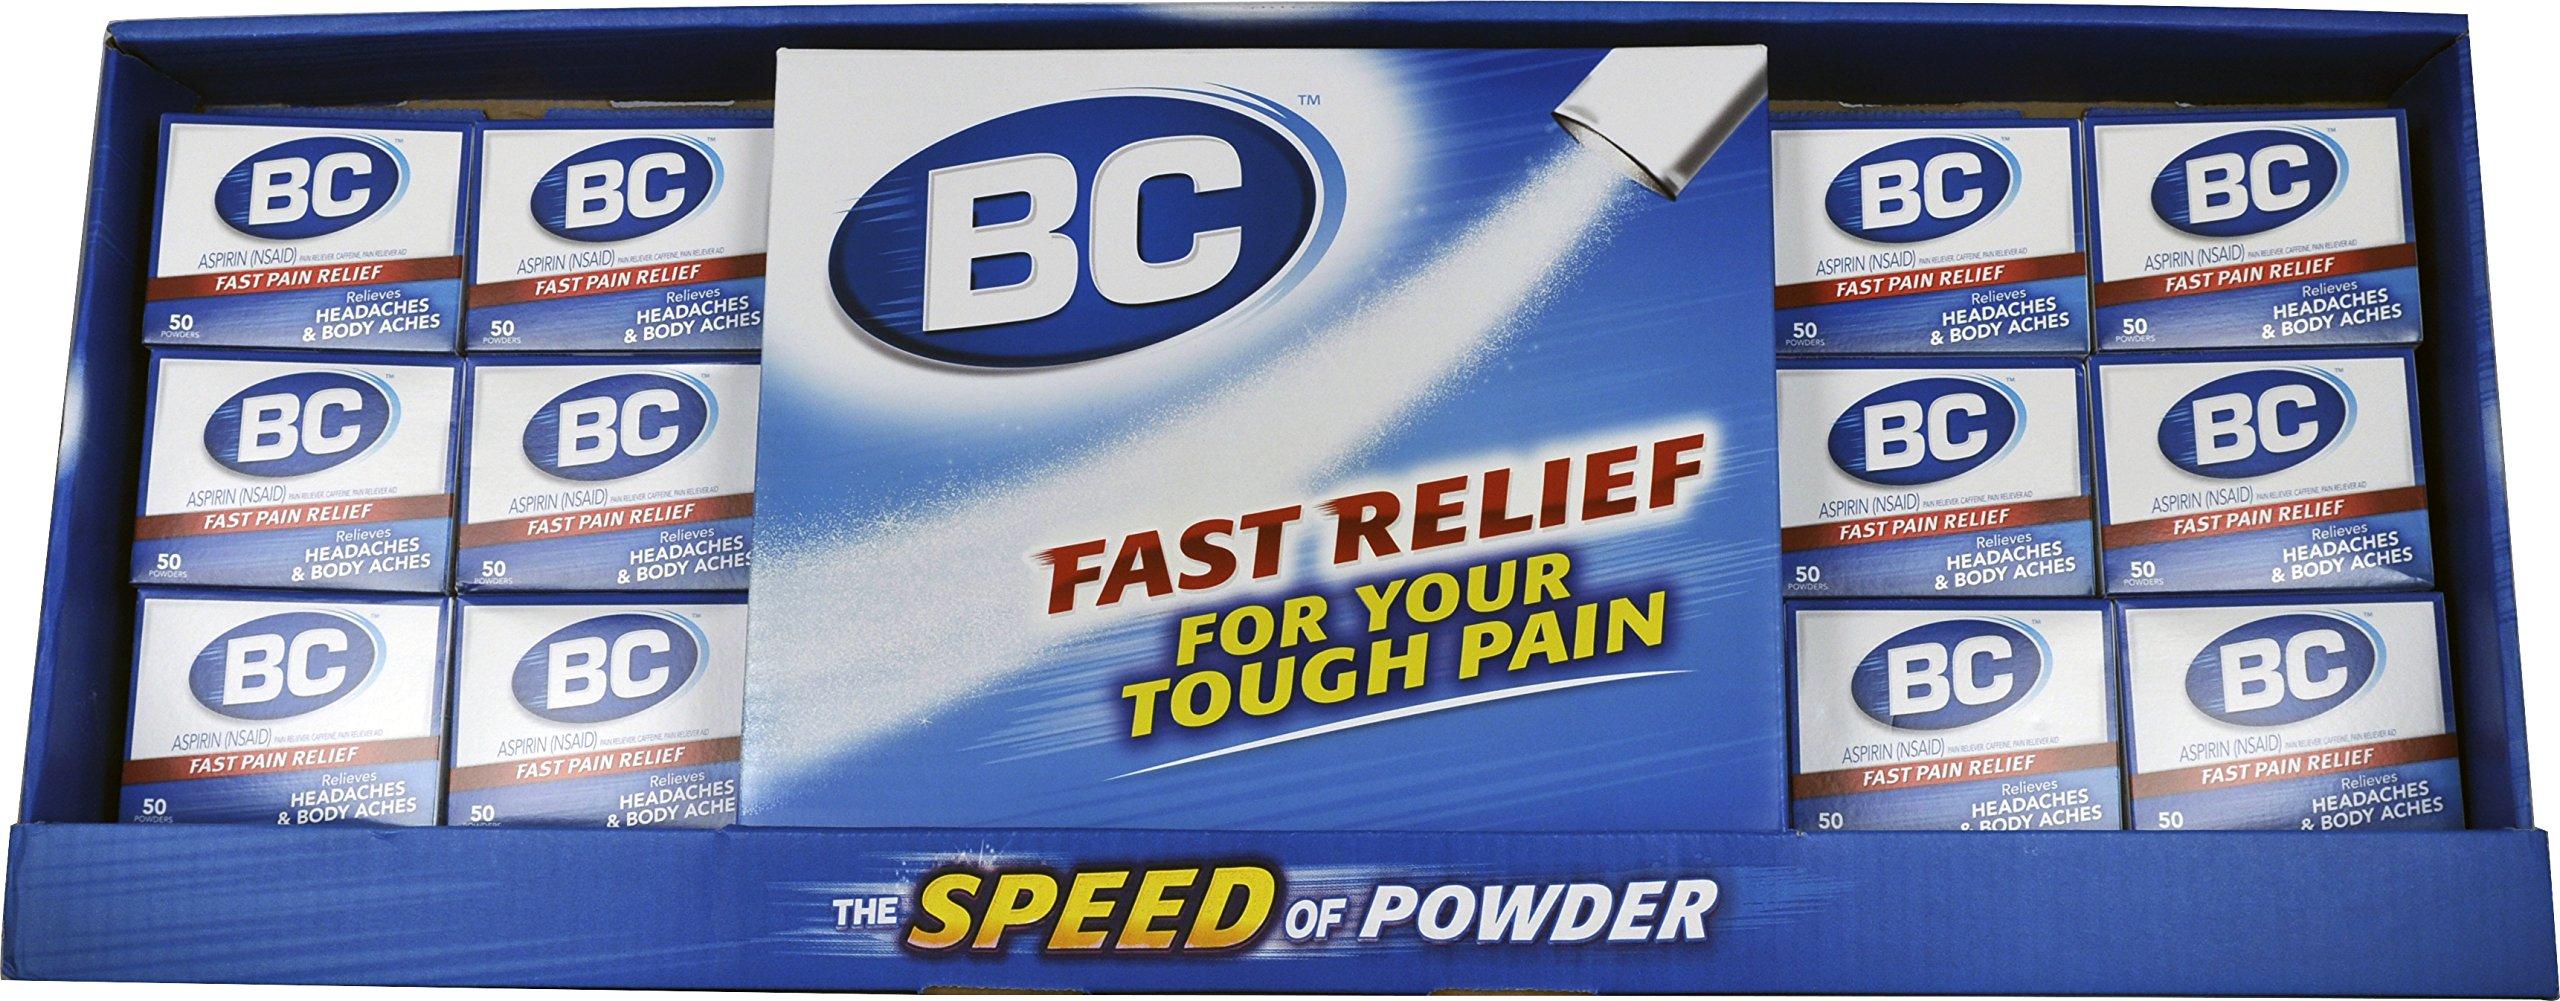 BC Powder, 48 Count